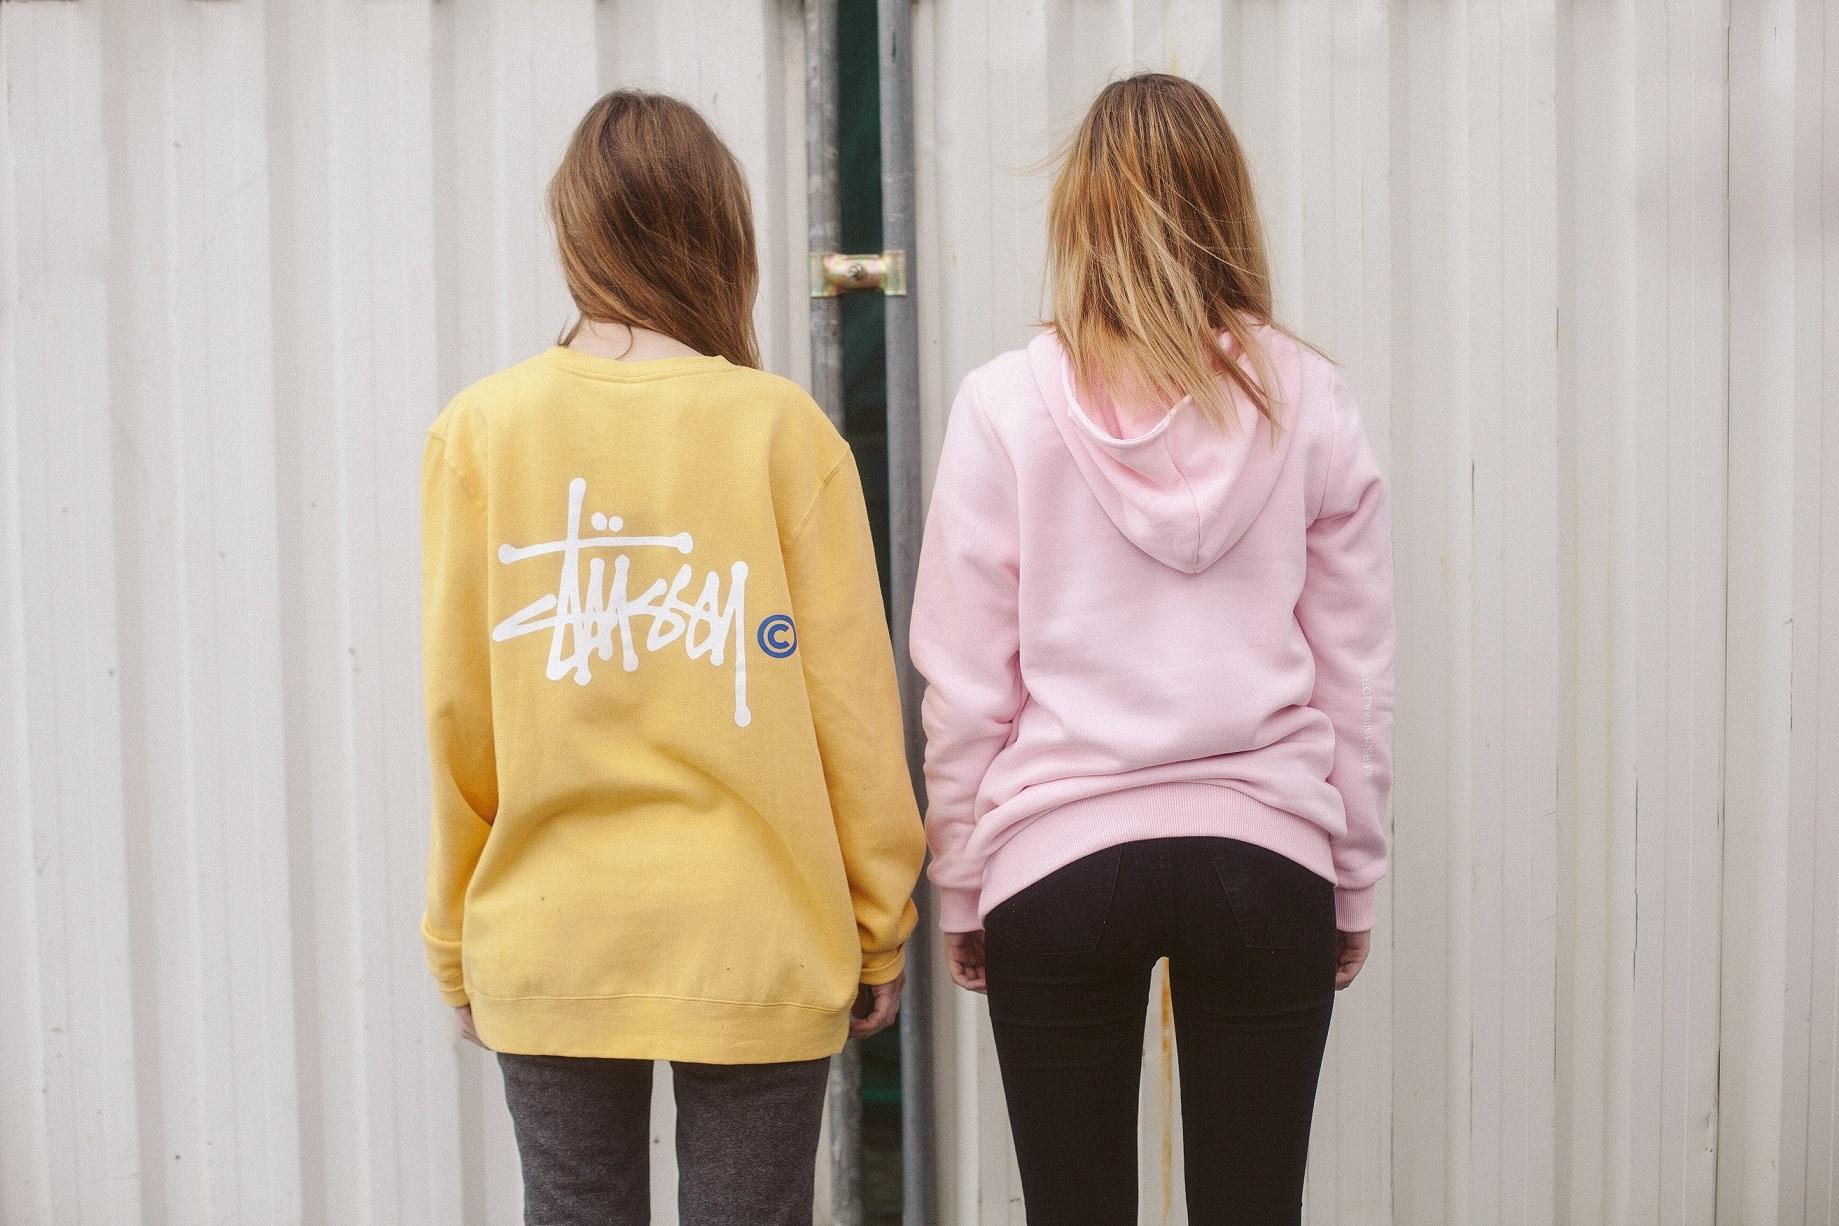 Shop by look w/ Adéla & Iva